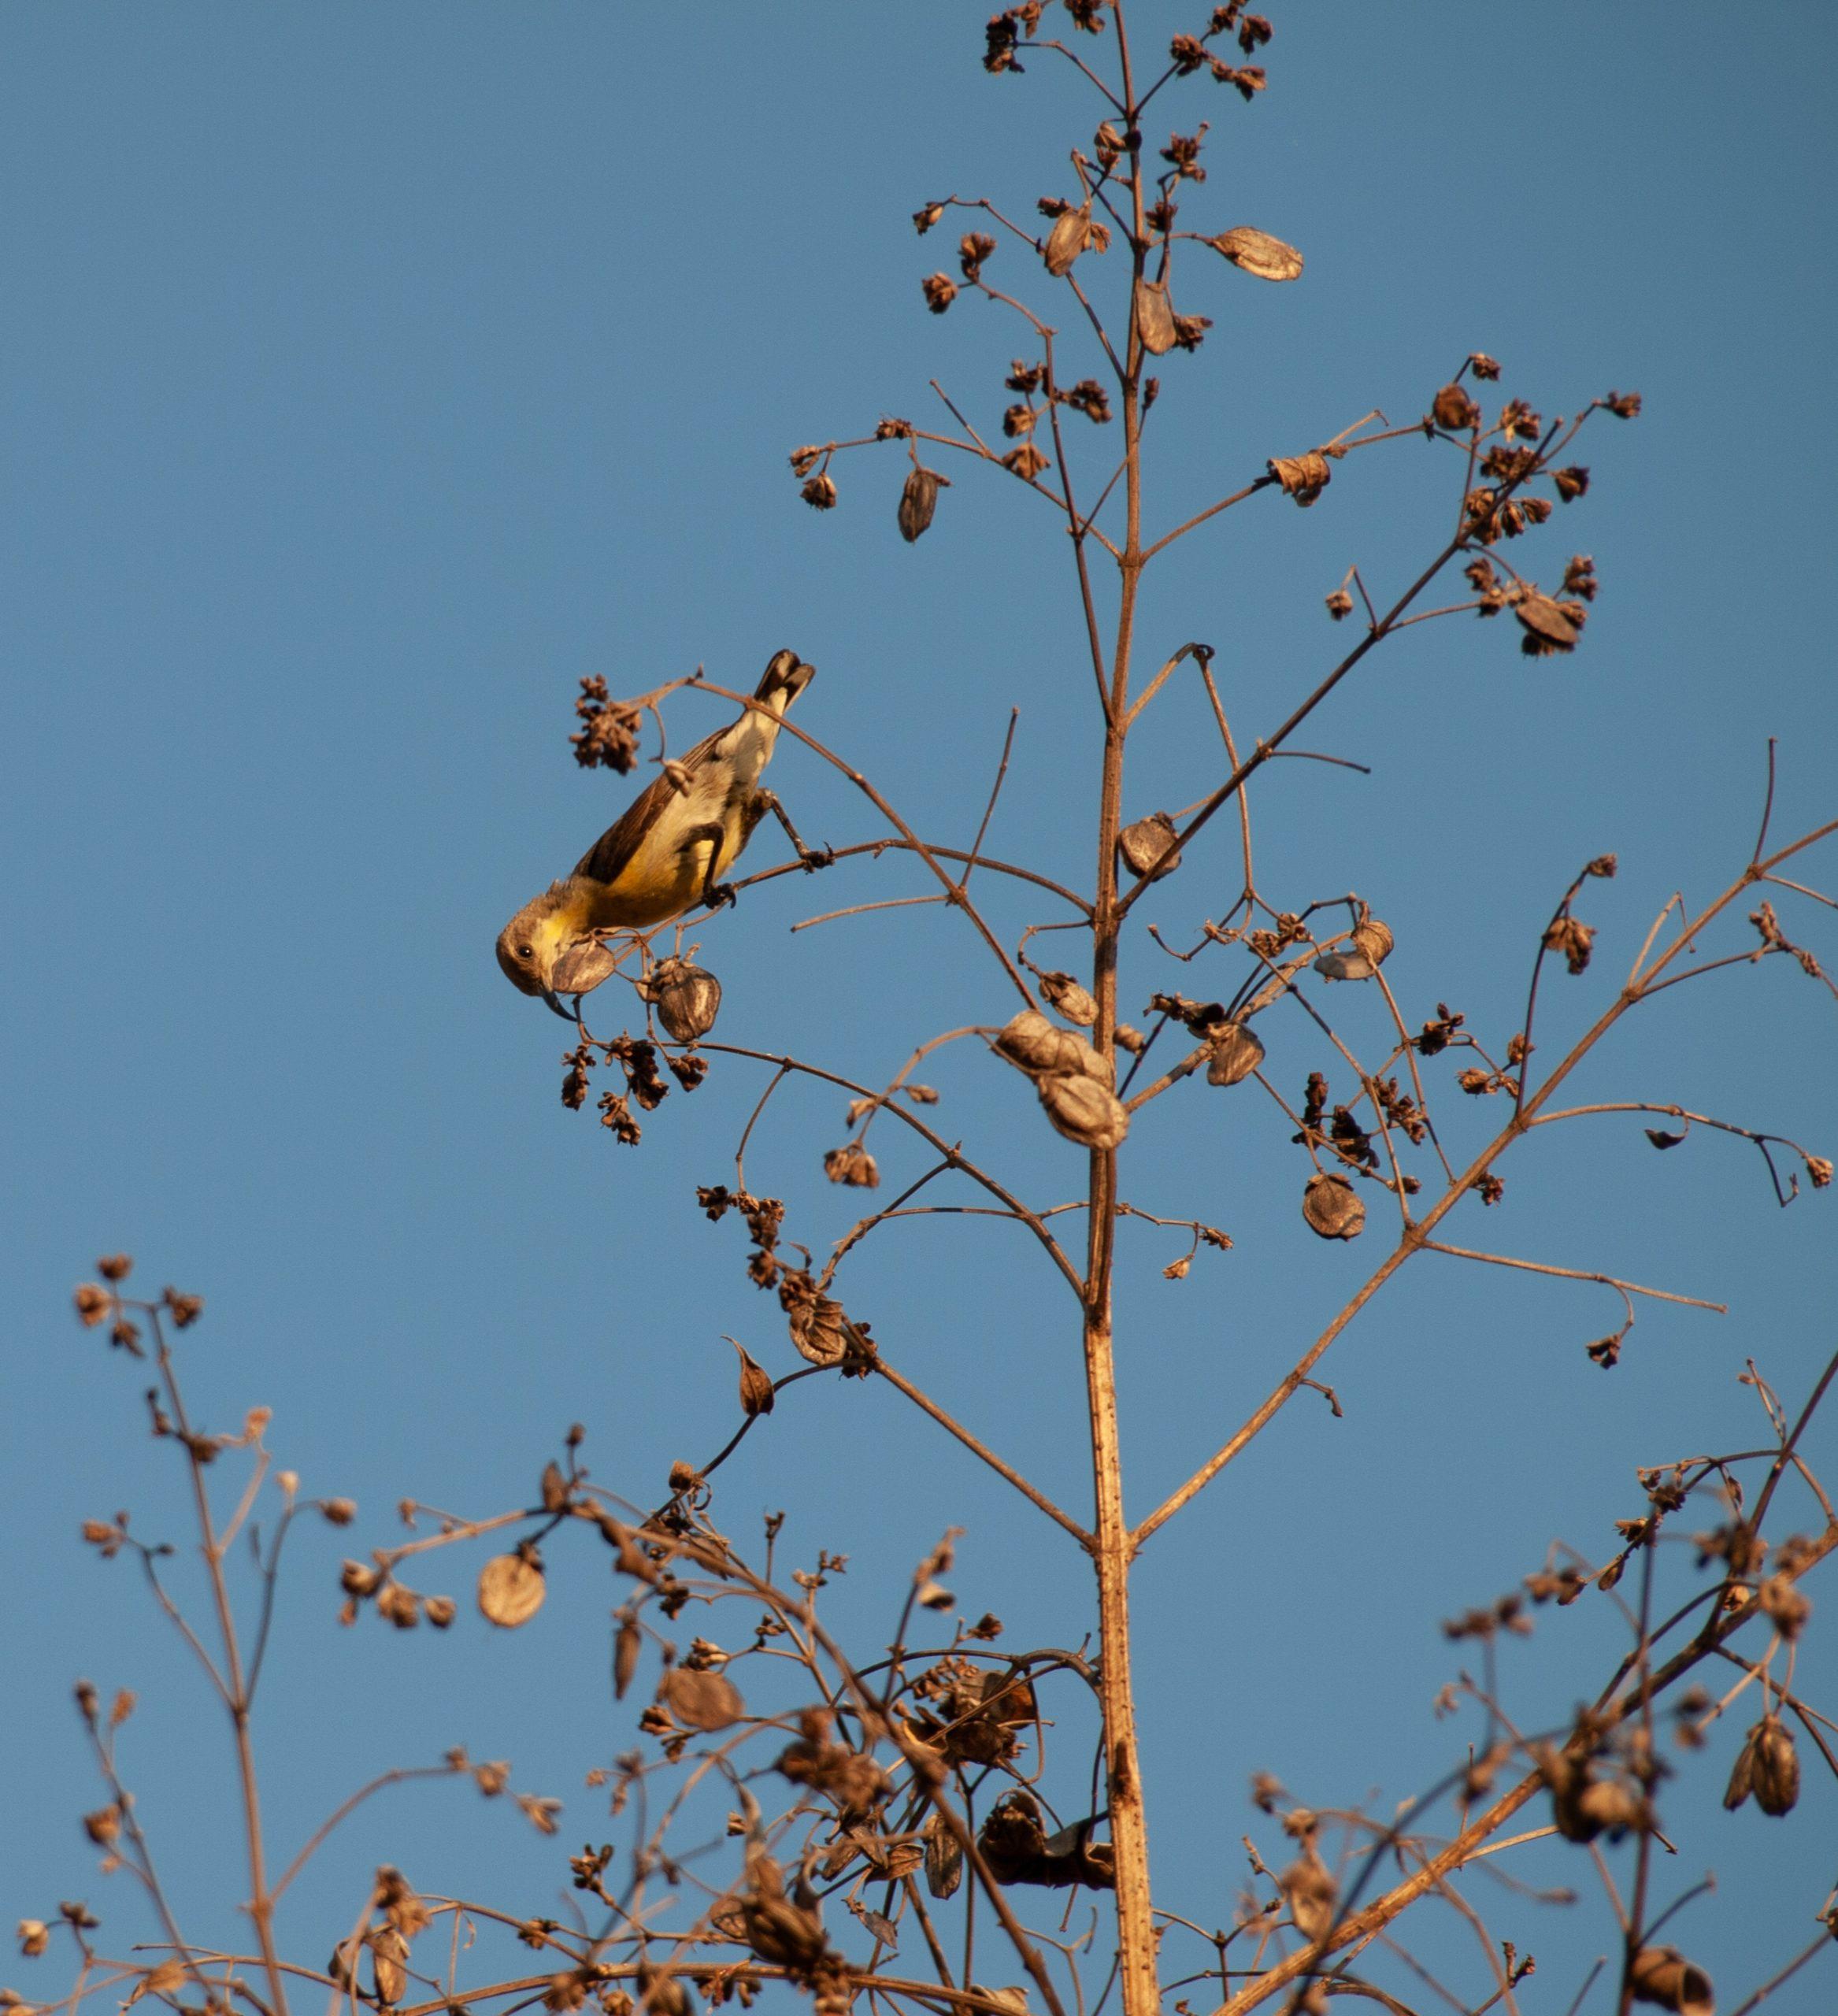 Bird sitting on the plant stem